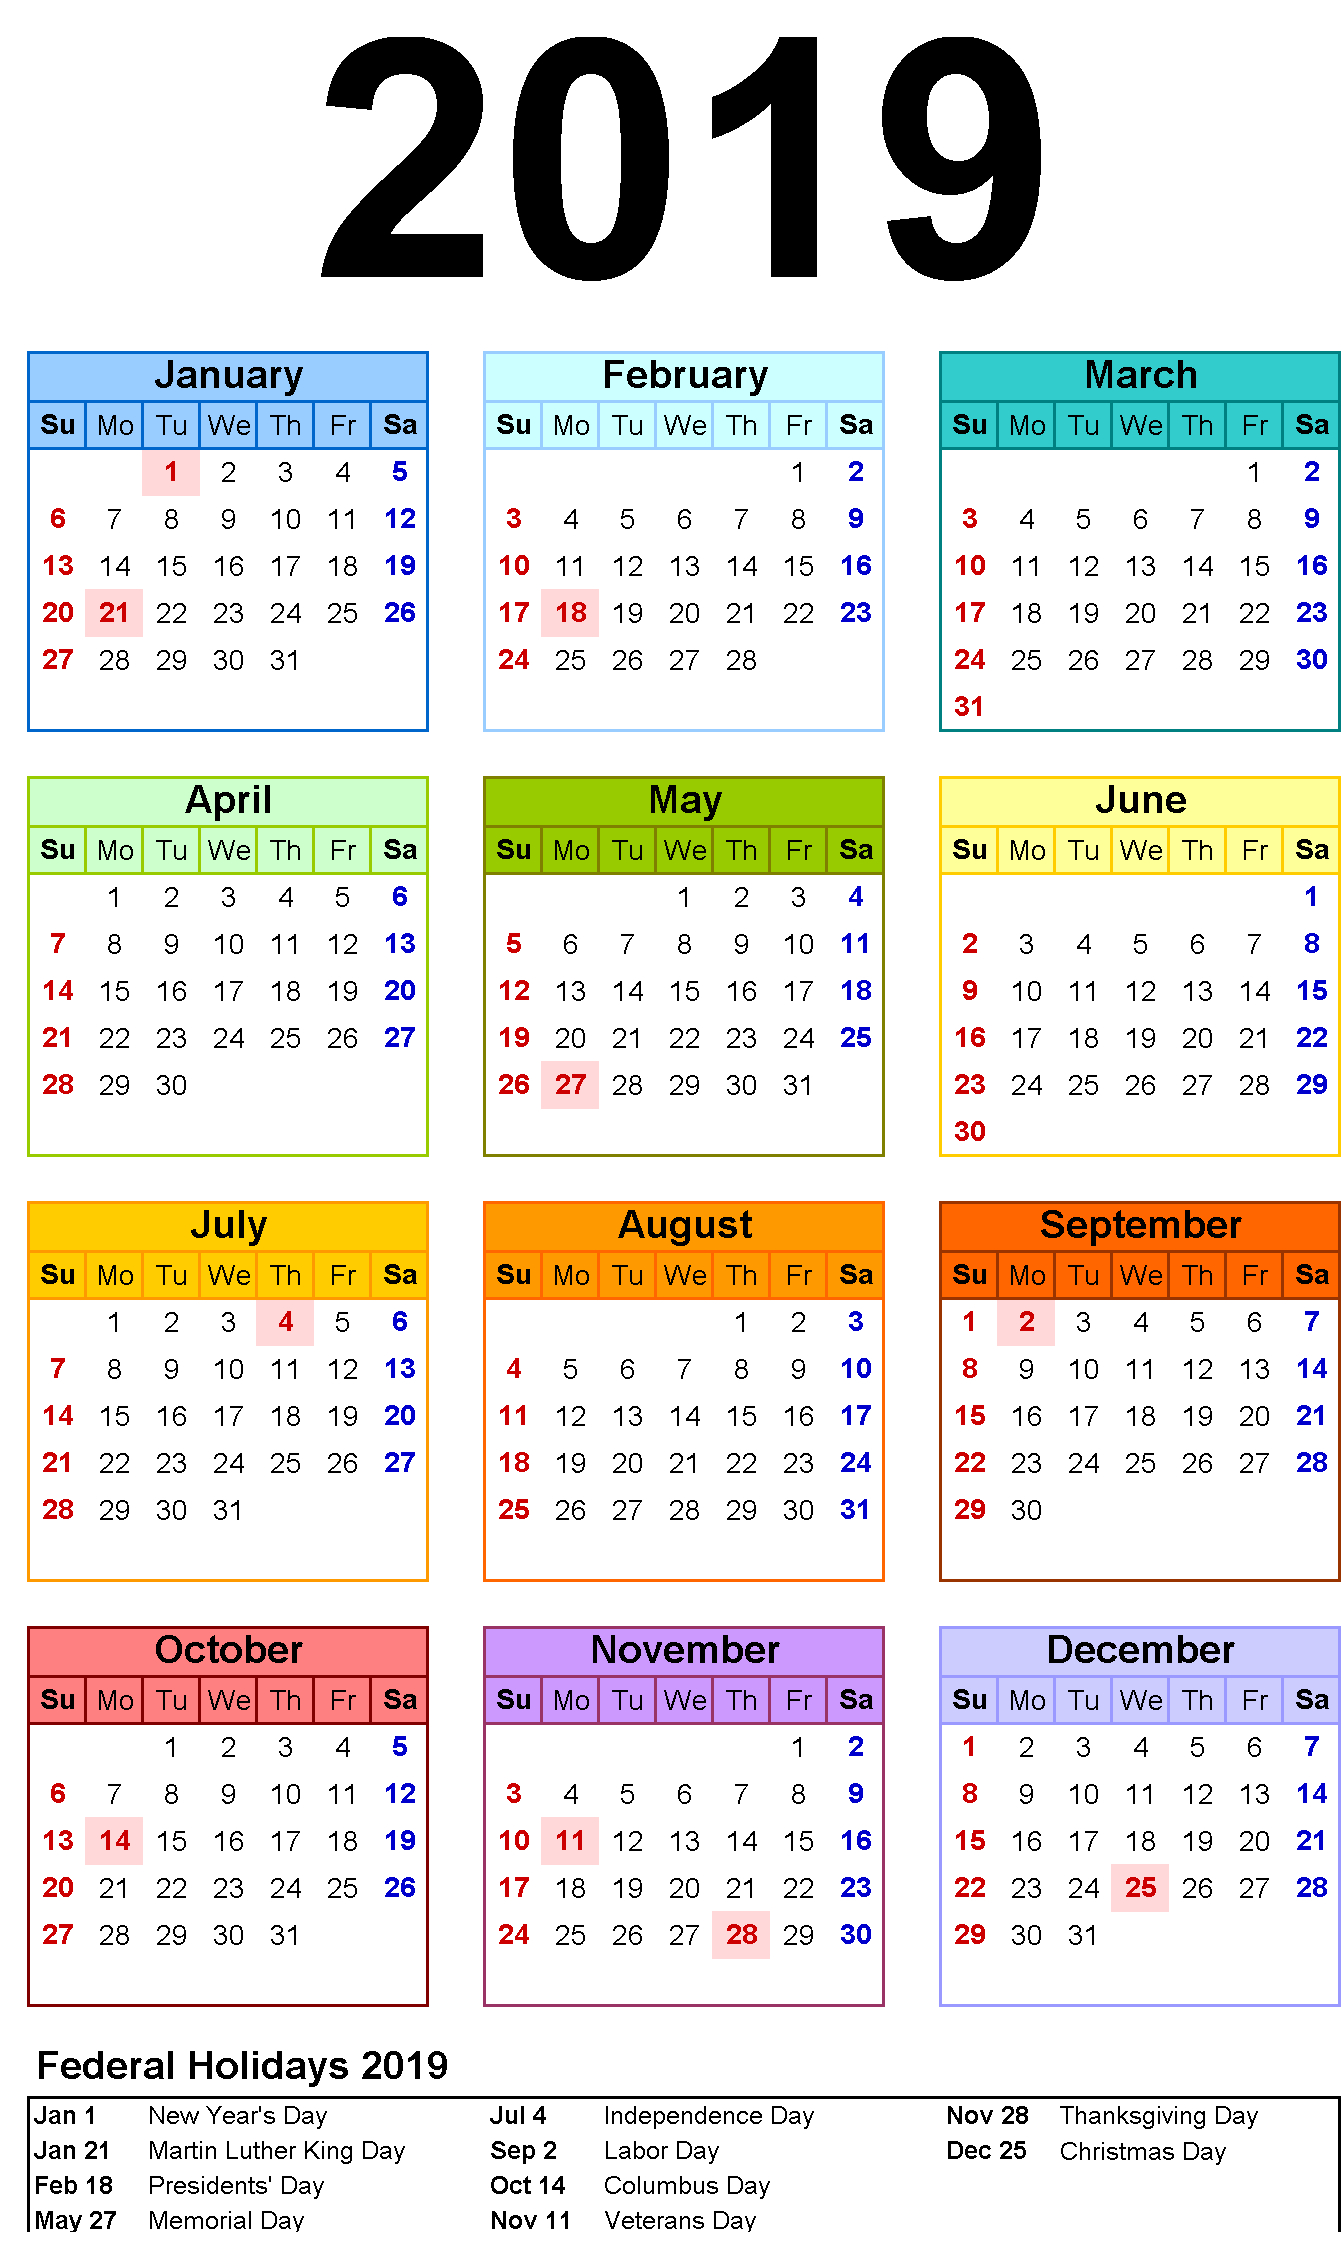 12 Month Calendar In One Page #2019Calendar #holidayscalendar throughout National Day Calendar 2020 Printable